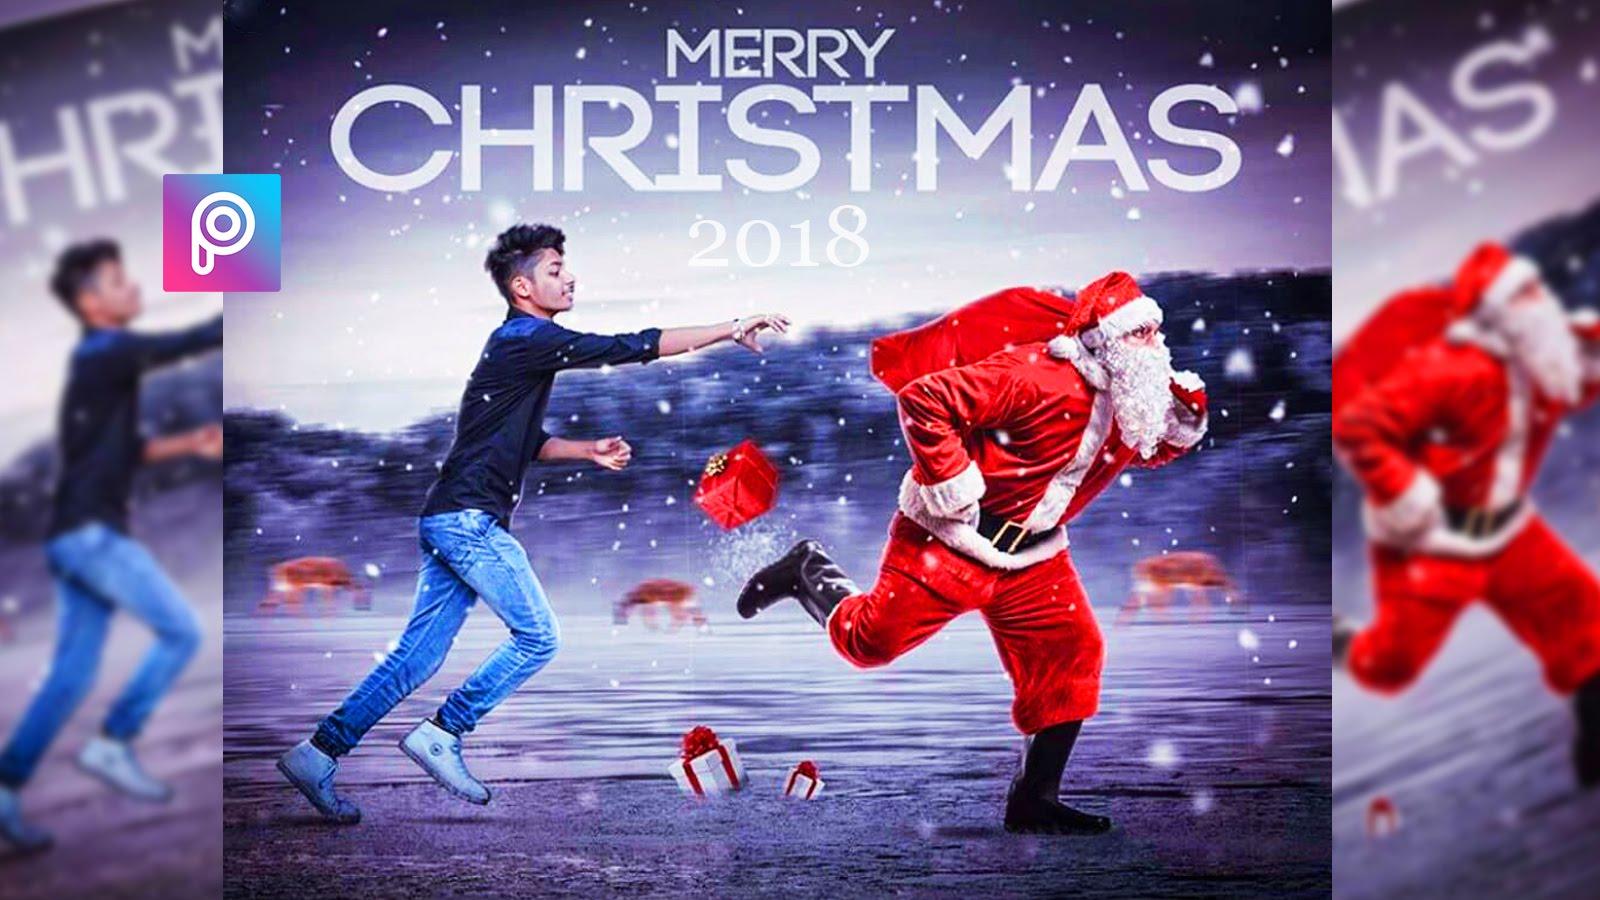 merry christmas new editing 20182018 merry christmas picsart editing new style